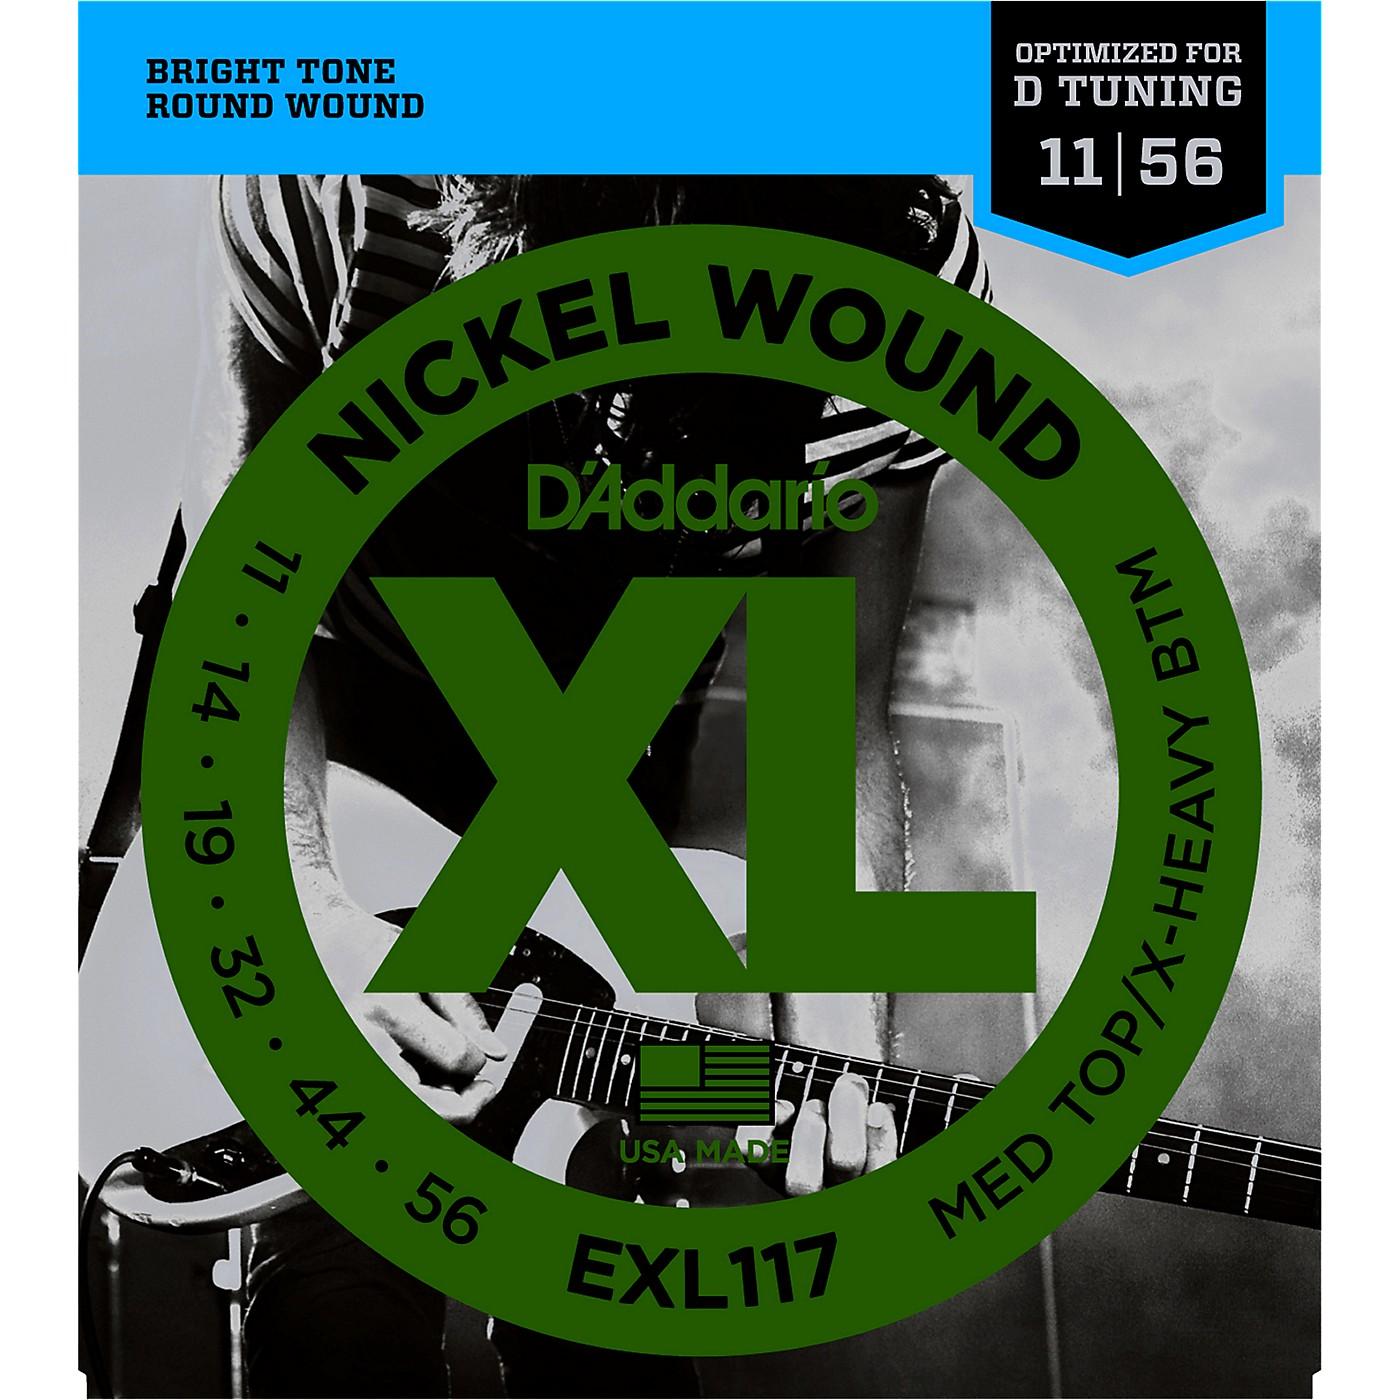 D'Addario EXL117 Medium Top/Extra-Heavy Bottom, Nickel-Wound Electric Guitar Strings thumbnail